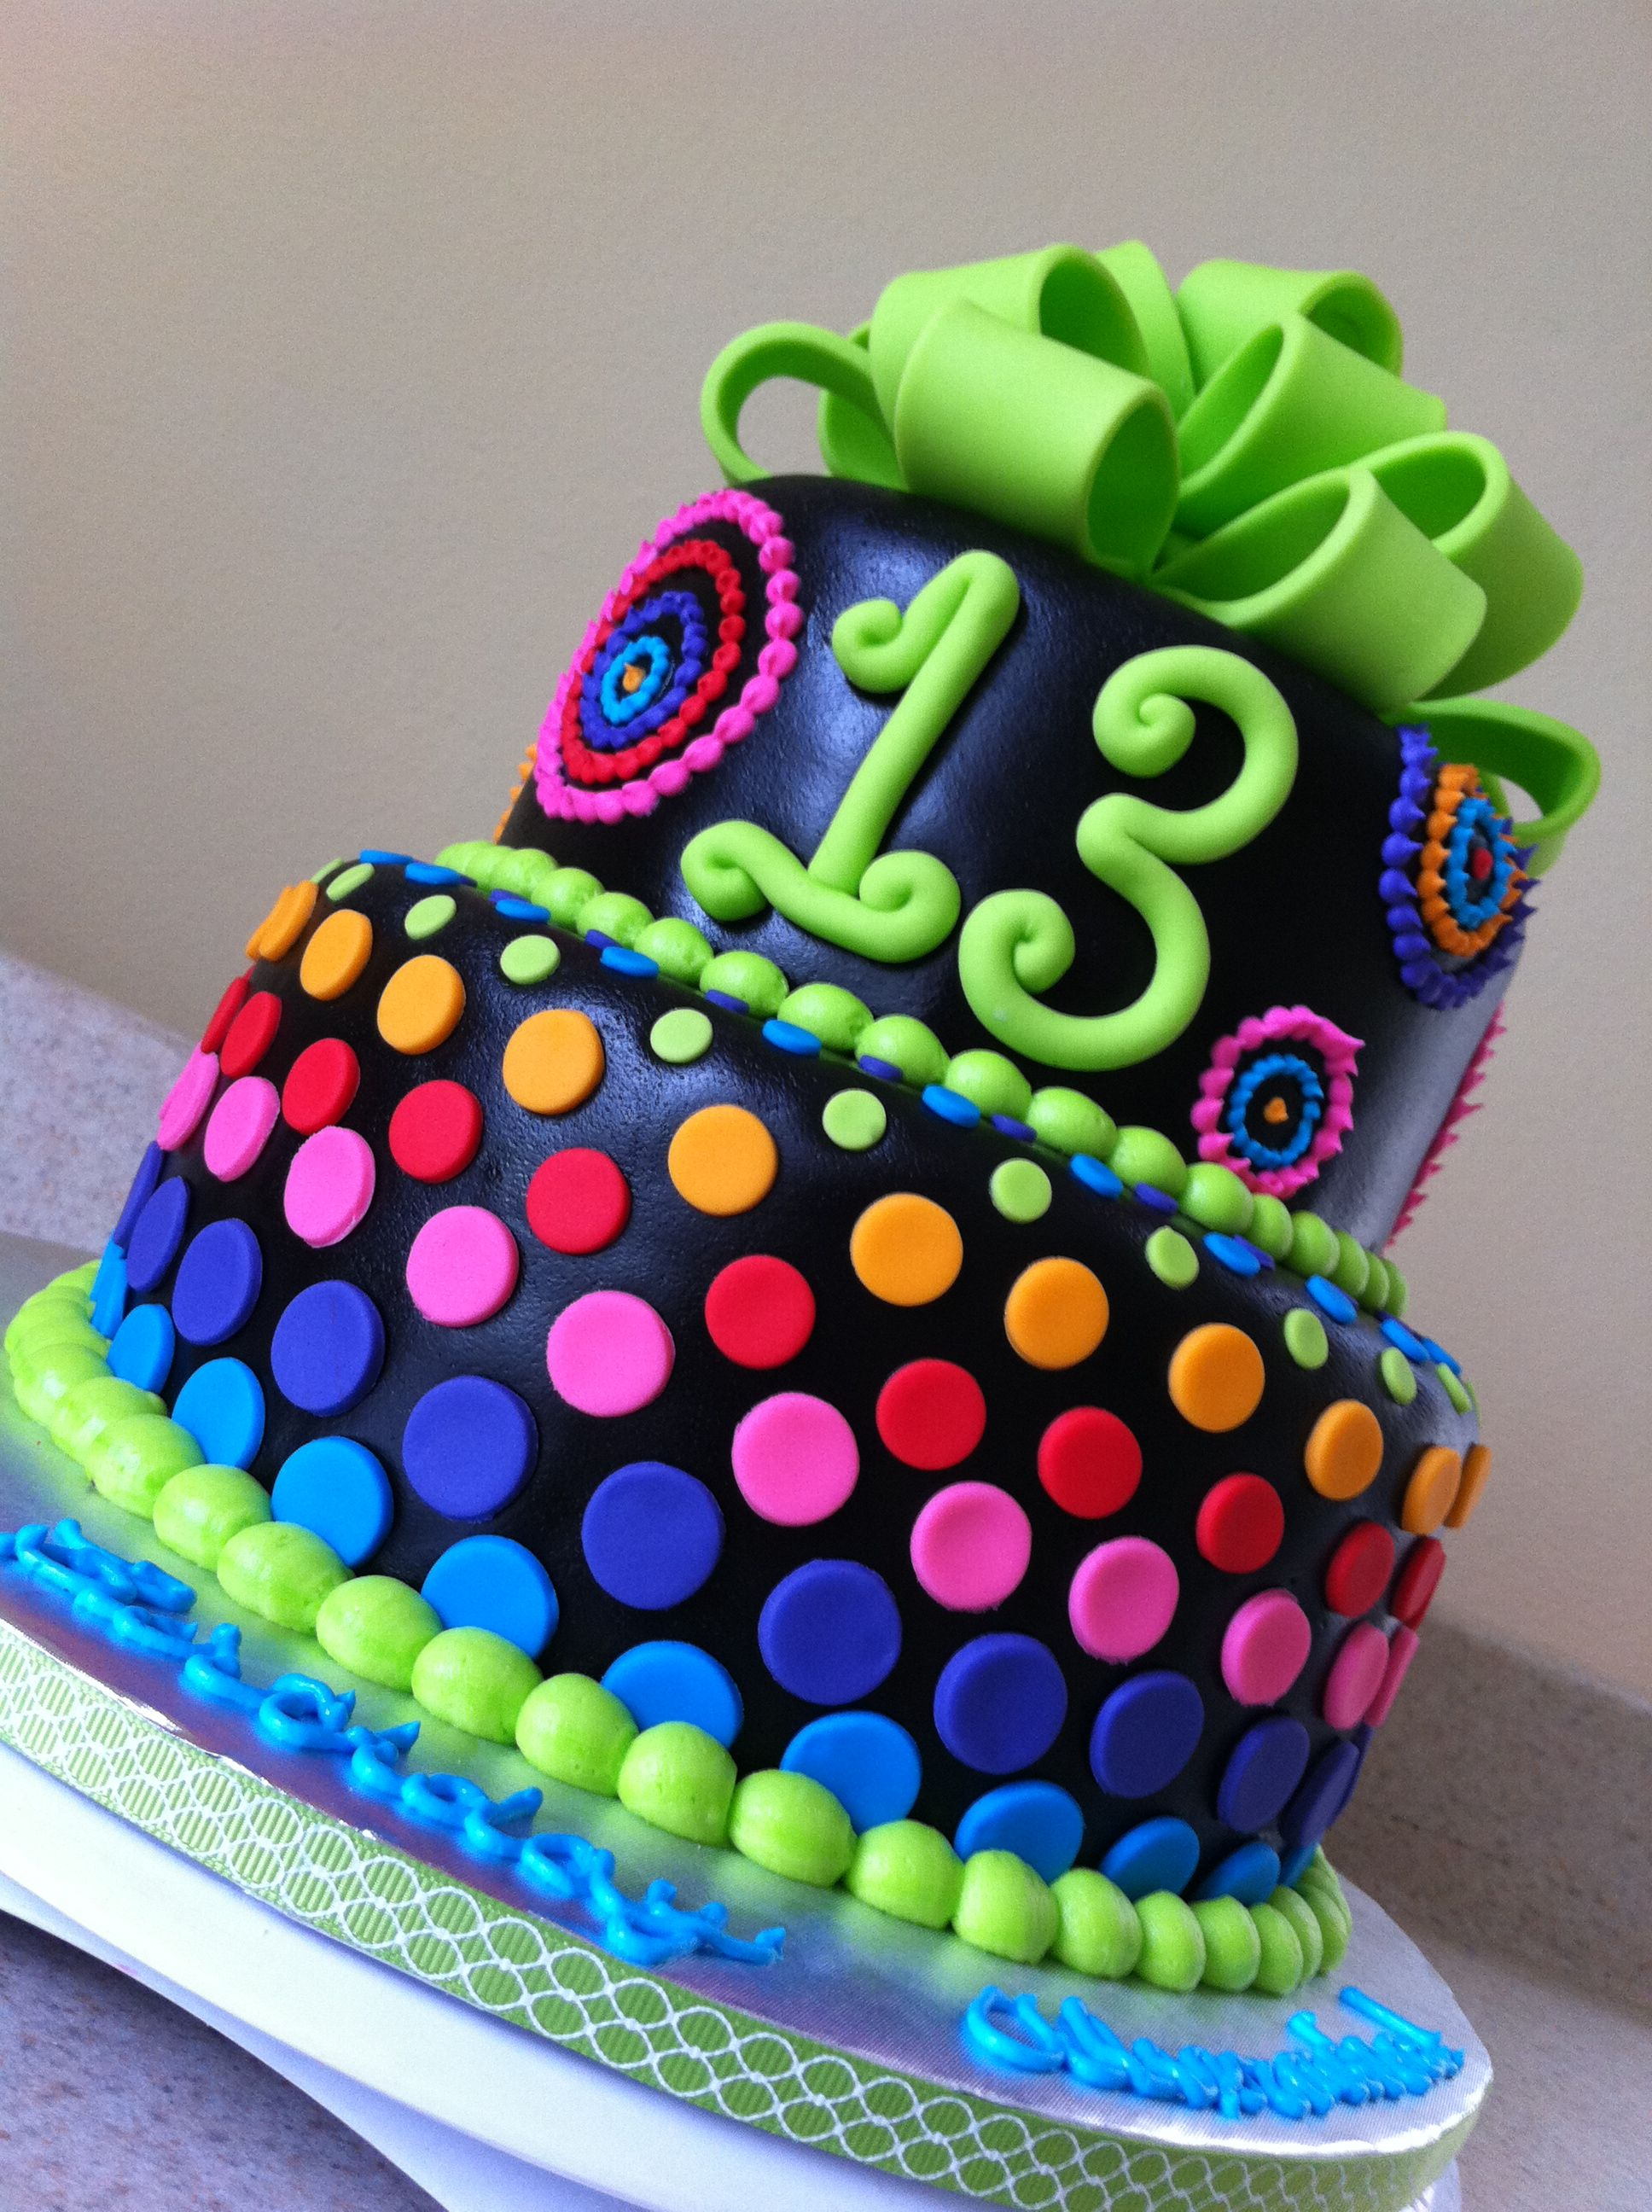 Amazing Birthday Cakes For Boys Amazing Birthday Cake Fun - Good birthday cake ideas